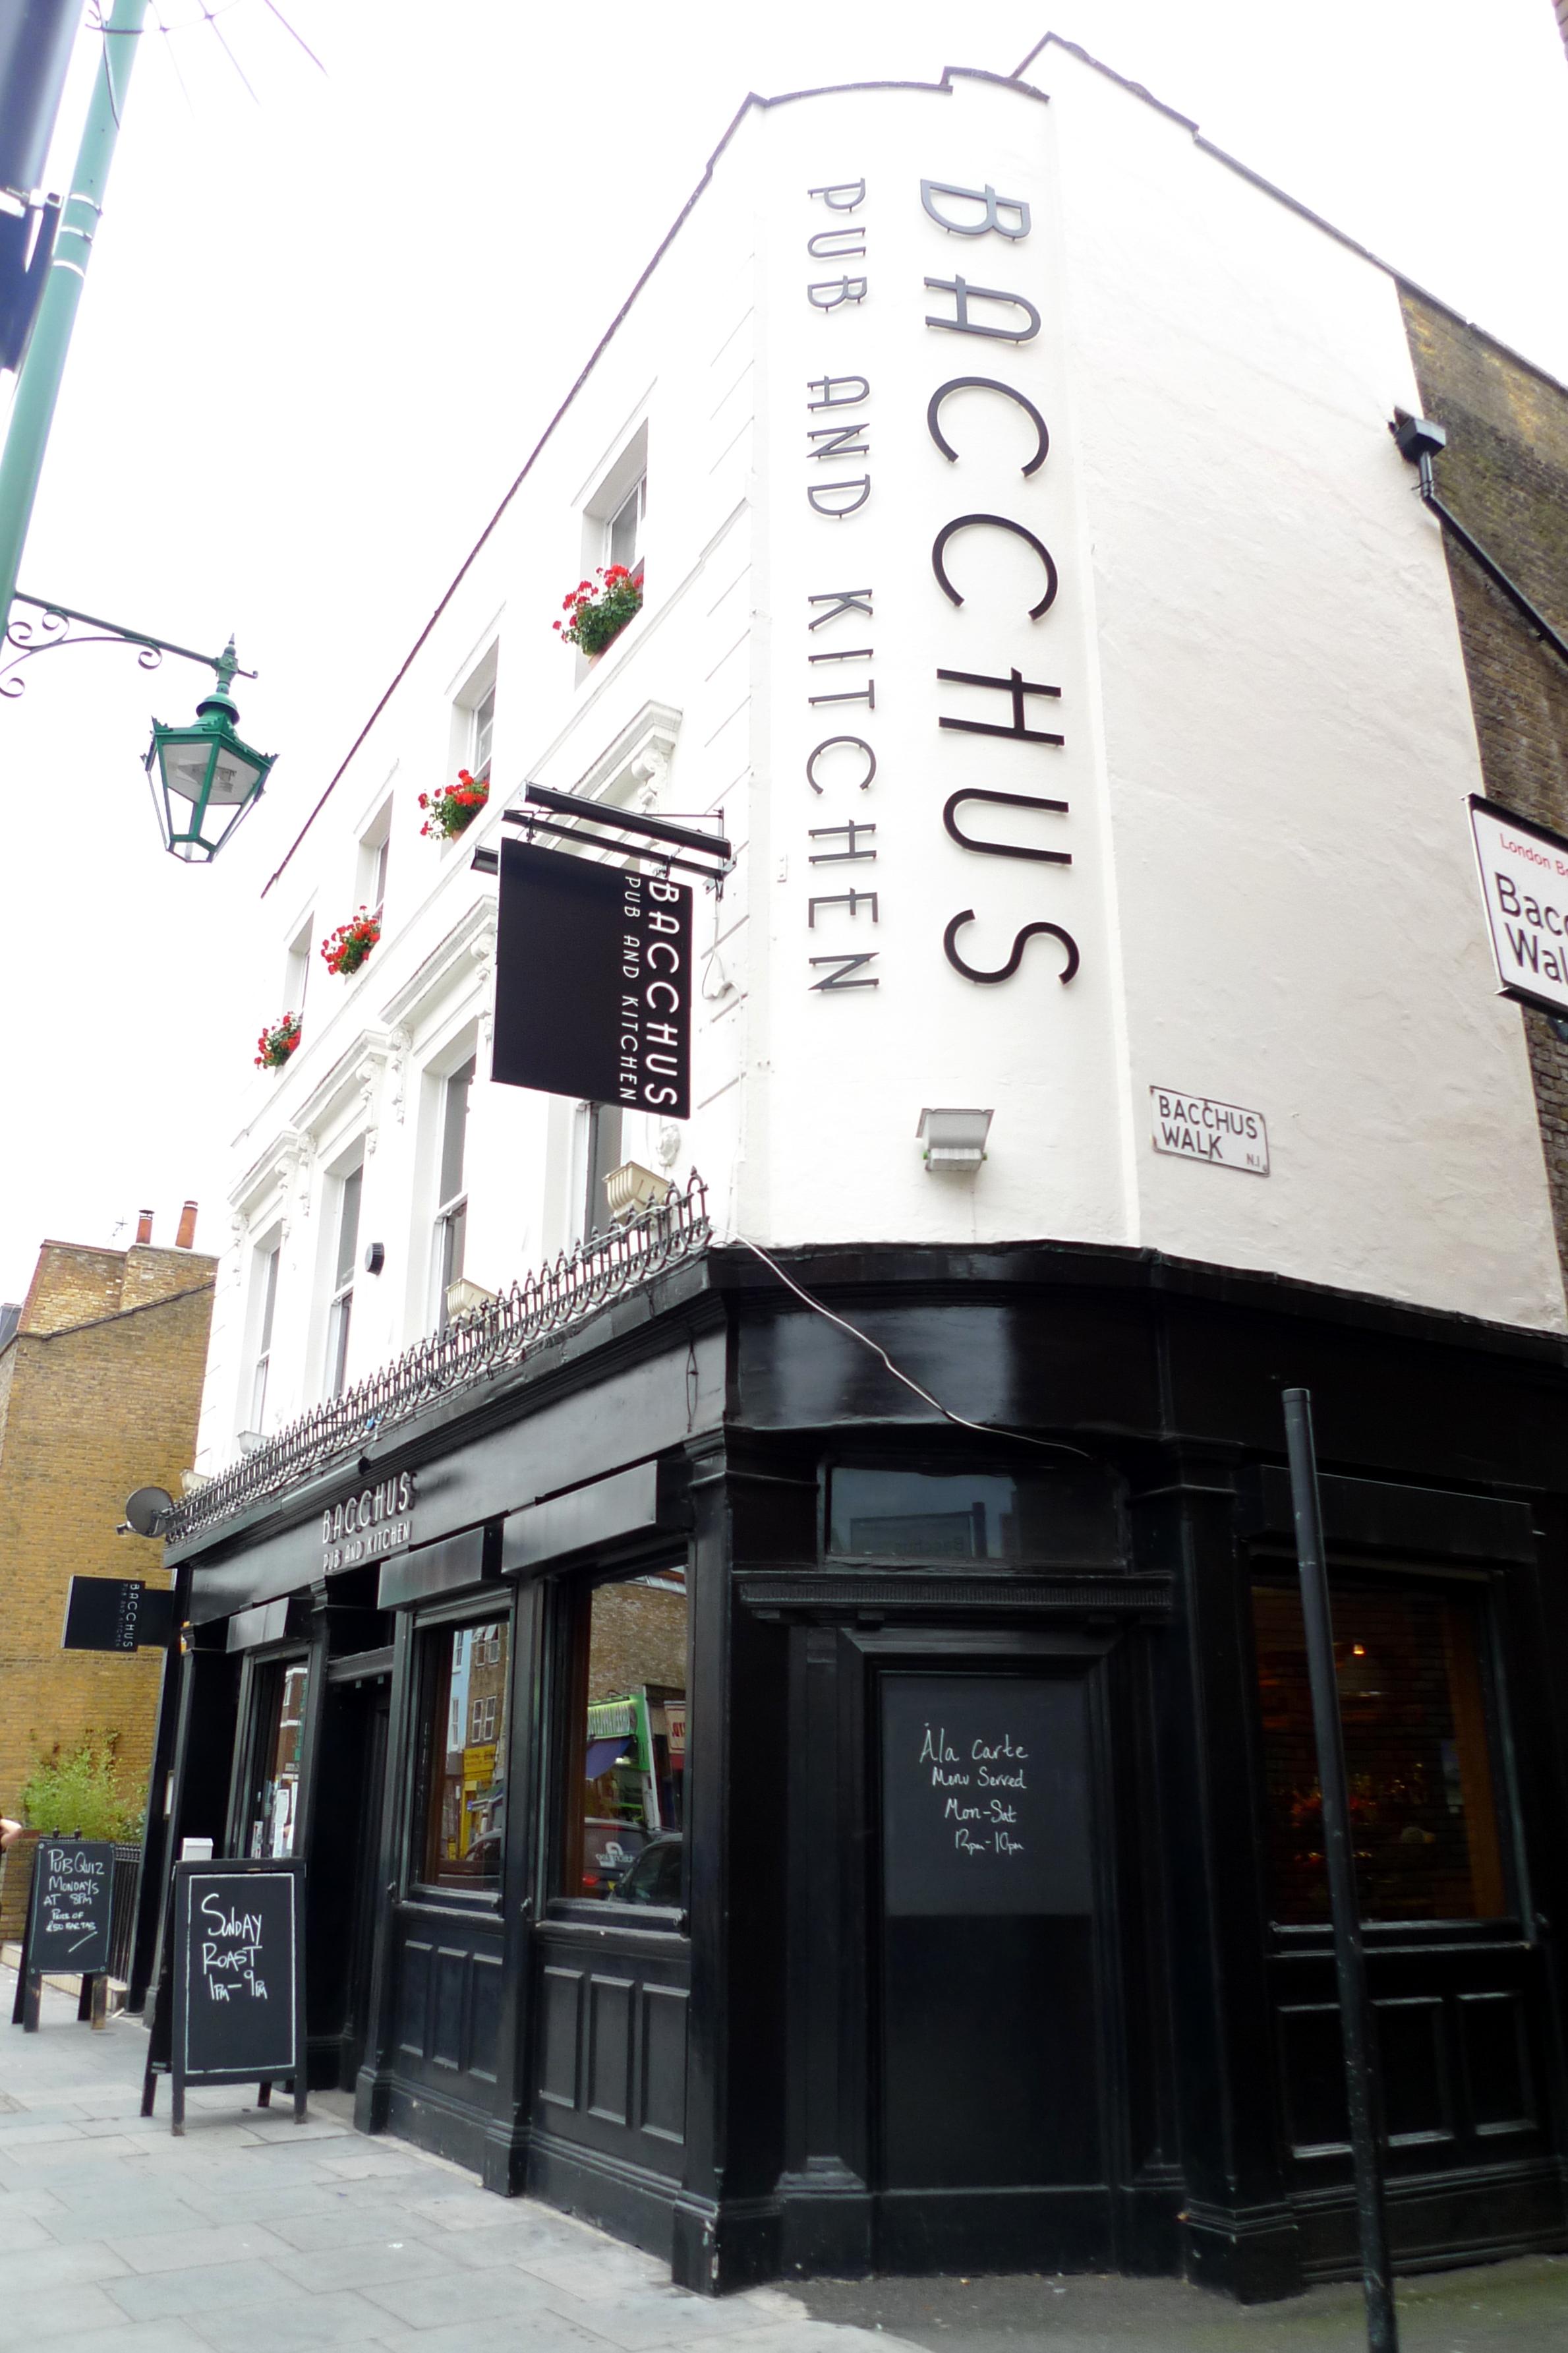 File:Bacchus Pub and Kitchen, Hoxton, N1 (6246150300).jpg ...